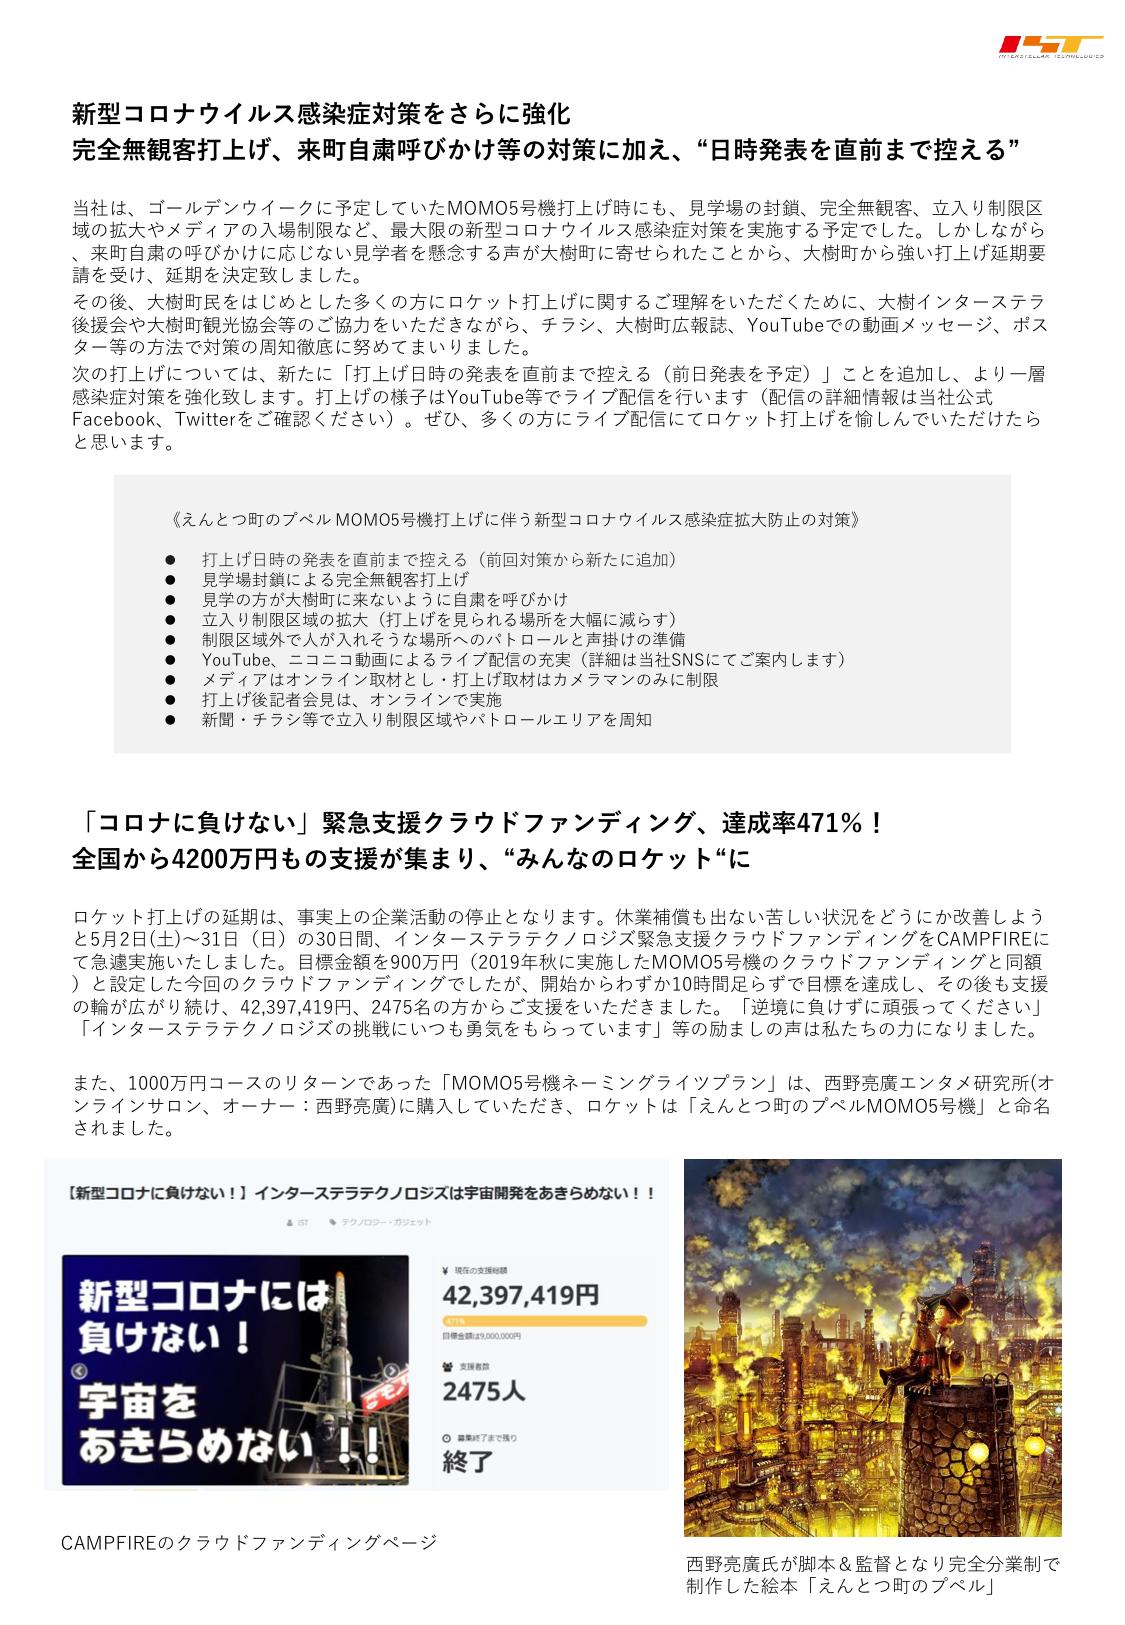 f:id:Imamura:20200603233335p:plain